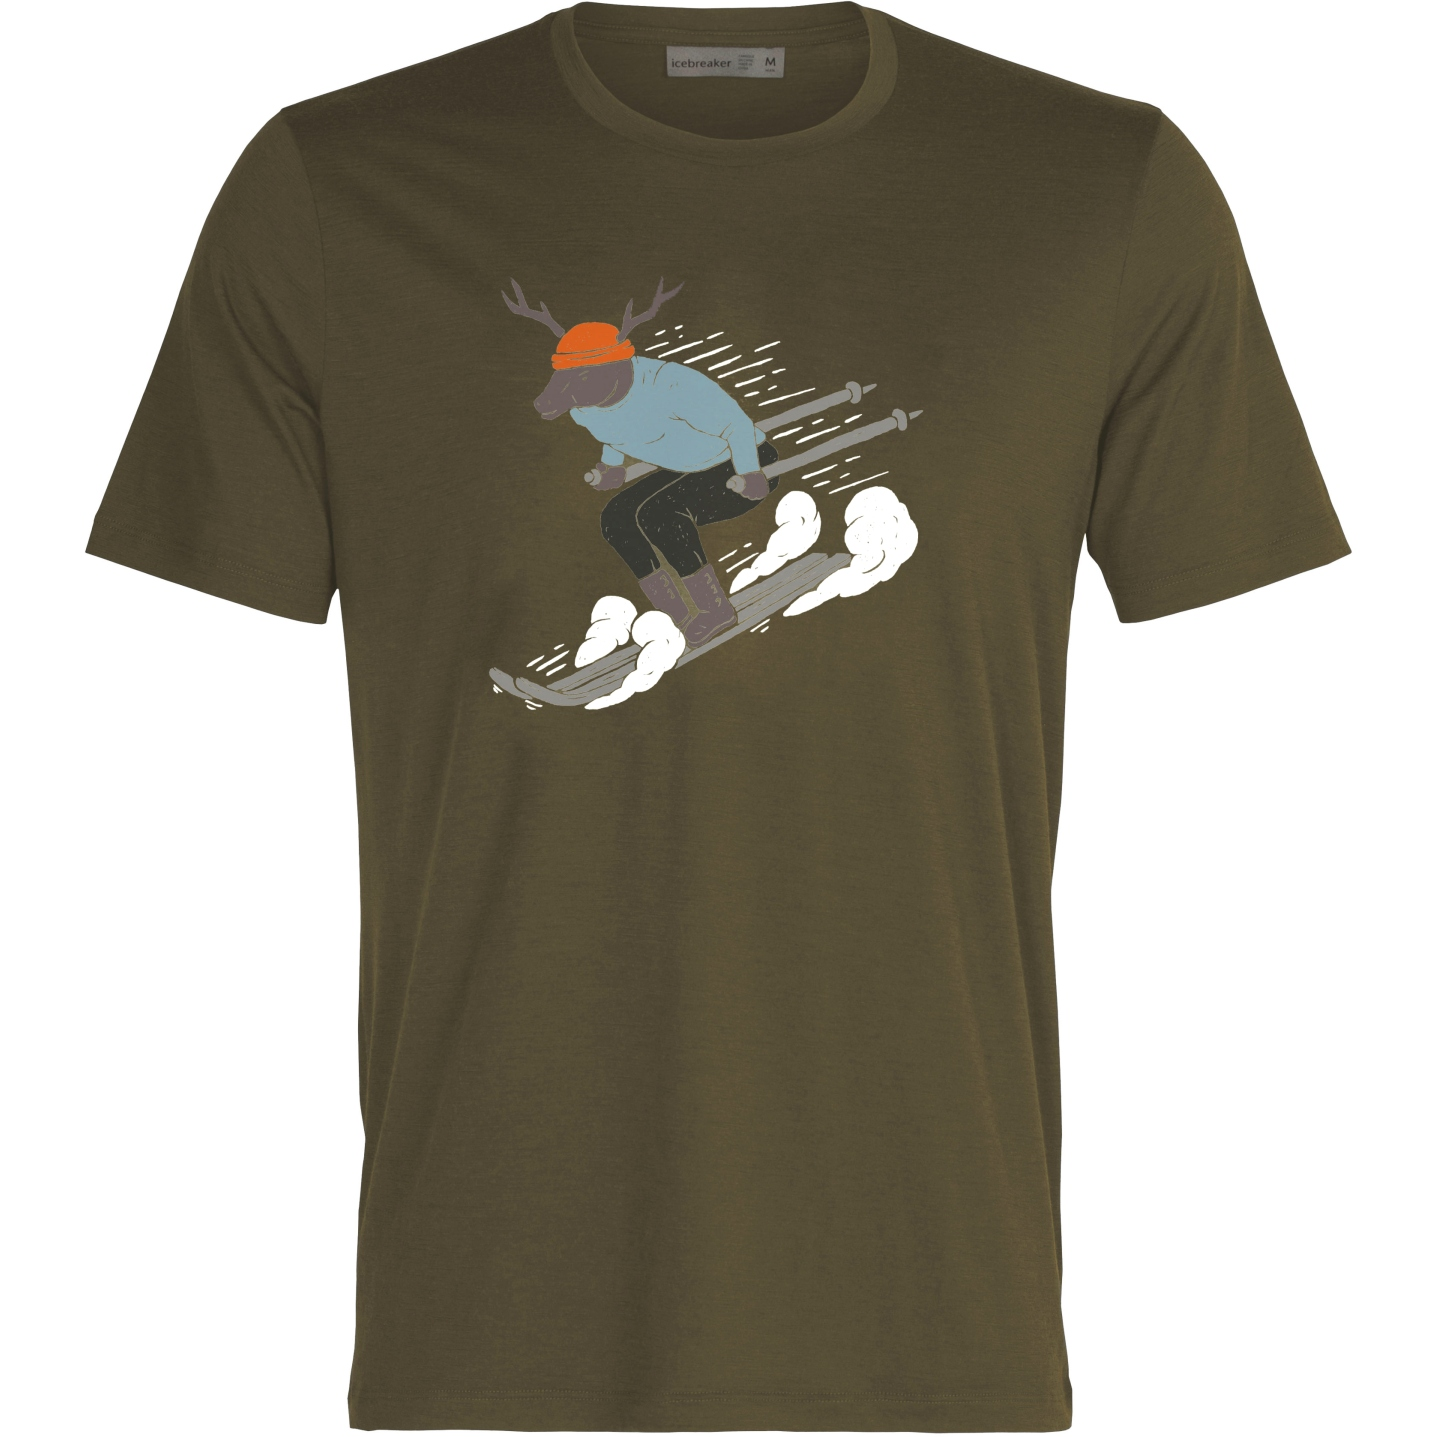 Icebreaker Tech Lite II Ski Rider Herren T-Shirt - Loden